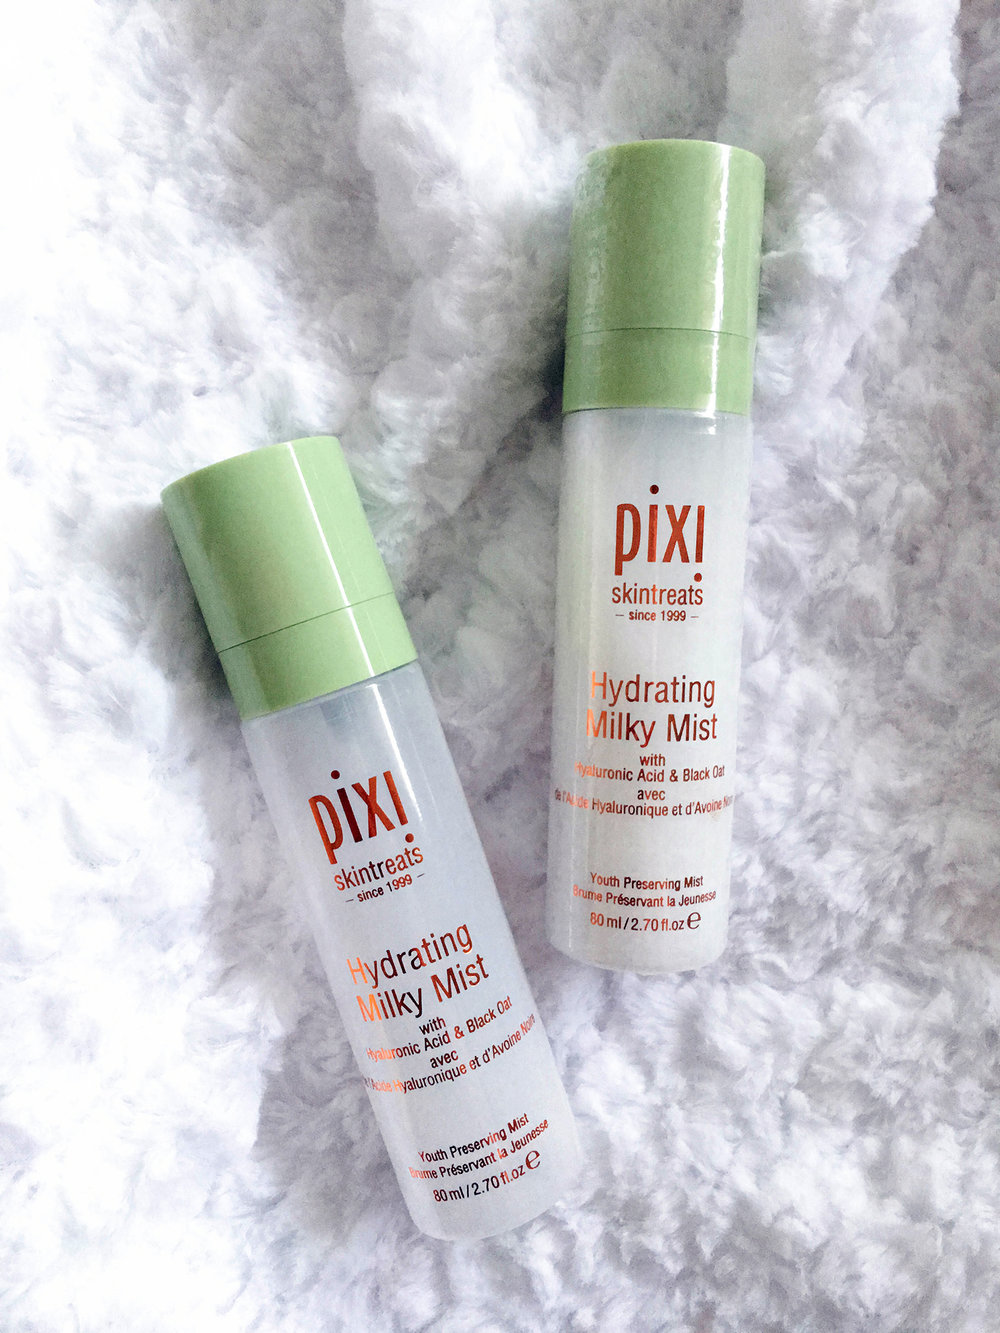 Pixi by Petra haul on beautybyjessika.com.